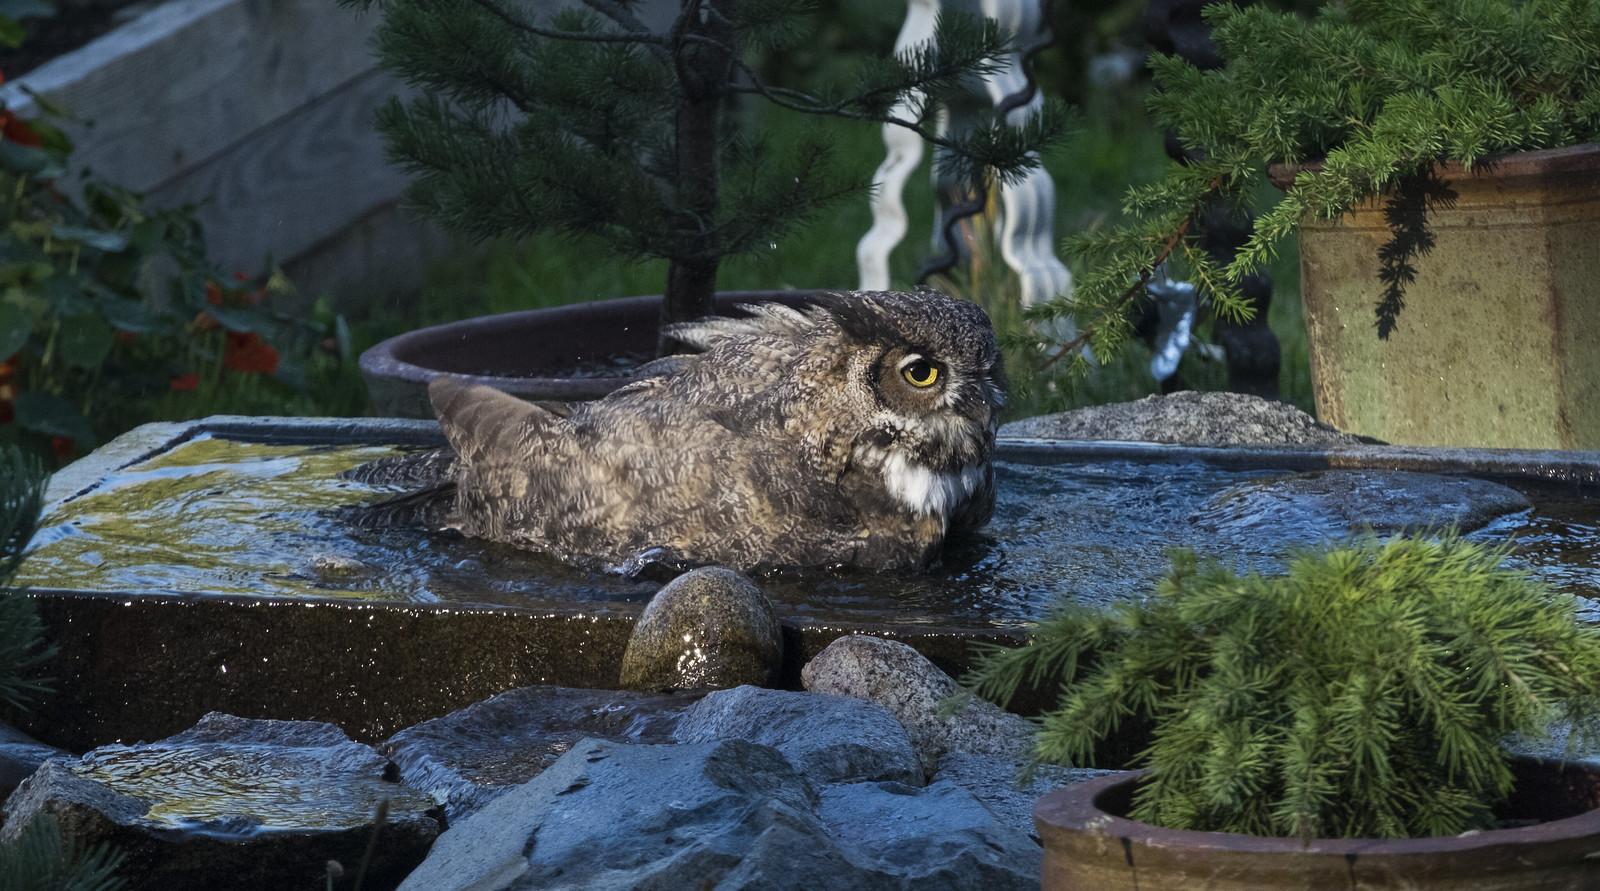 Owlbathing2bg | by Nicholas Lyle